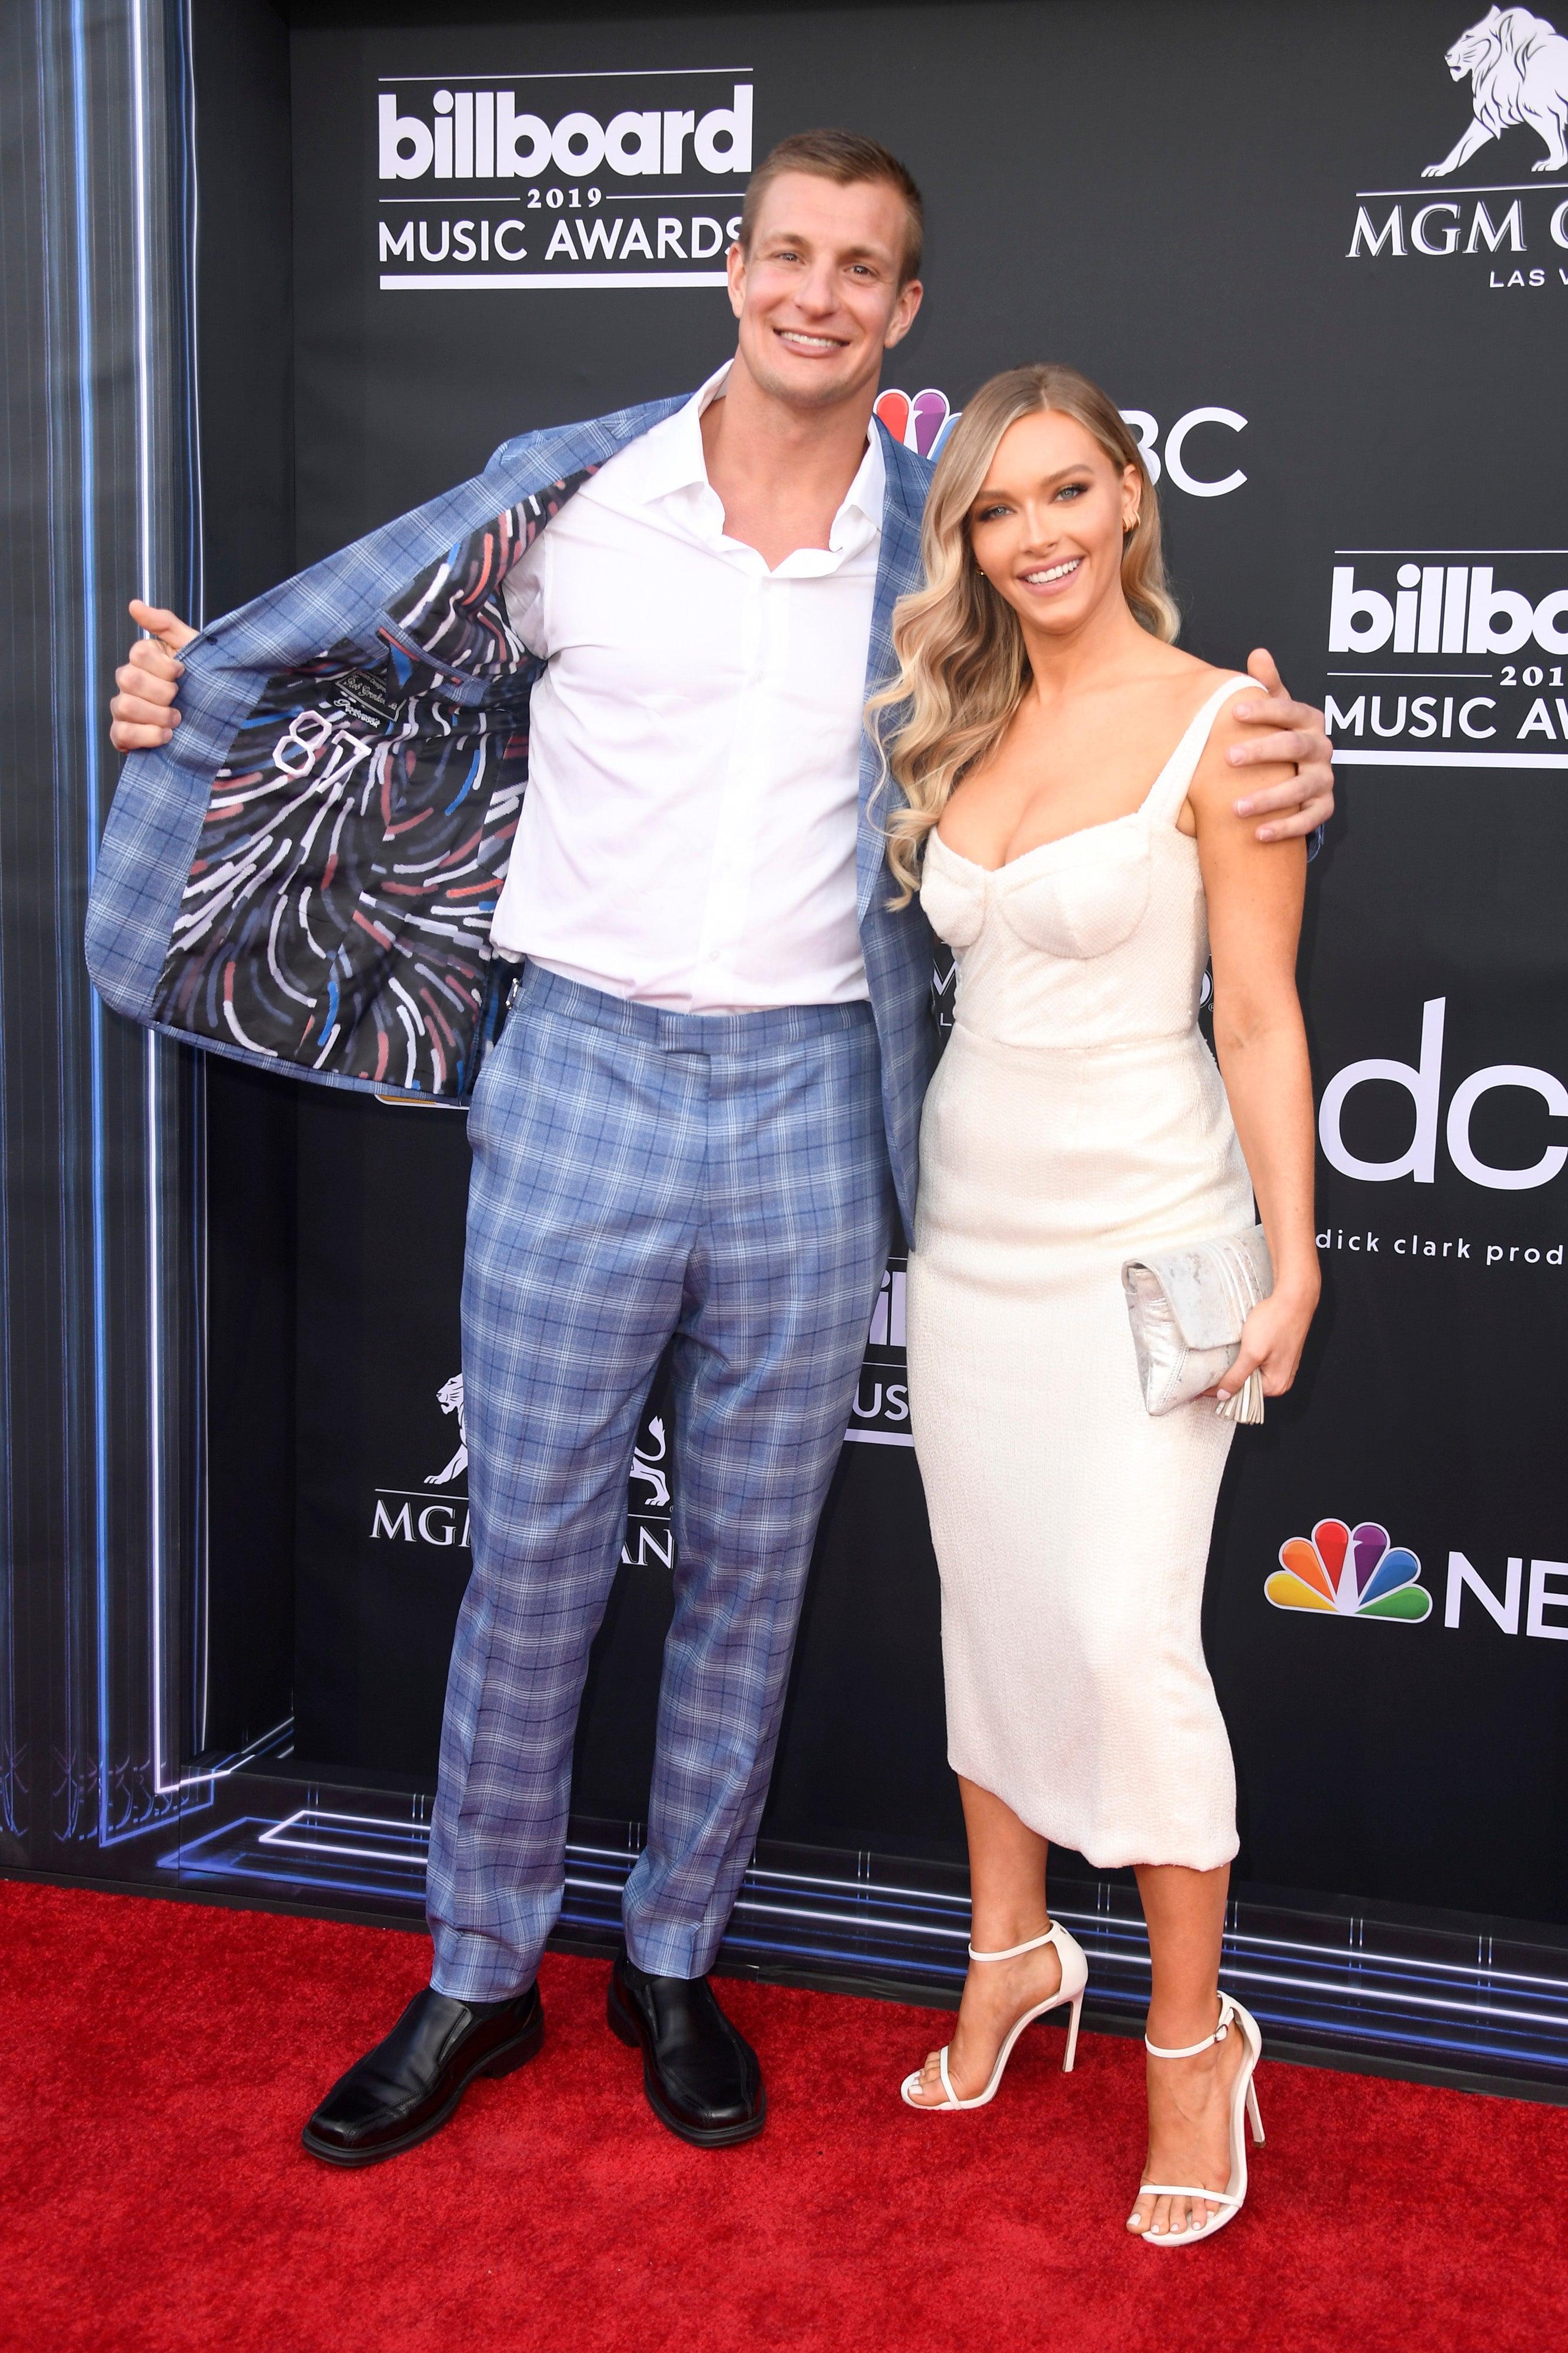 Rob Gronkowski Camille Kostek Billboard Music Awards - Arrivals